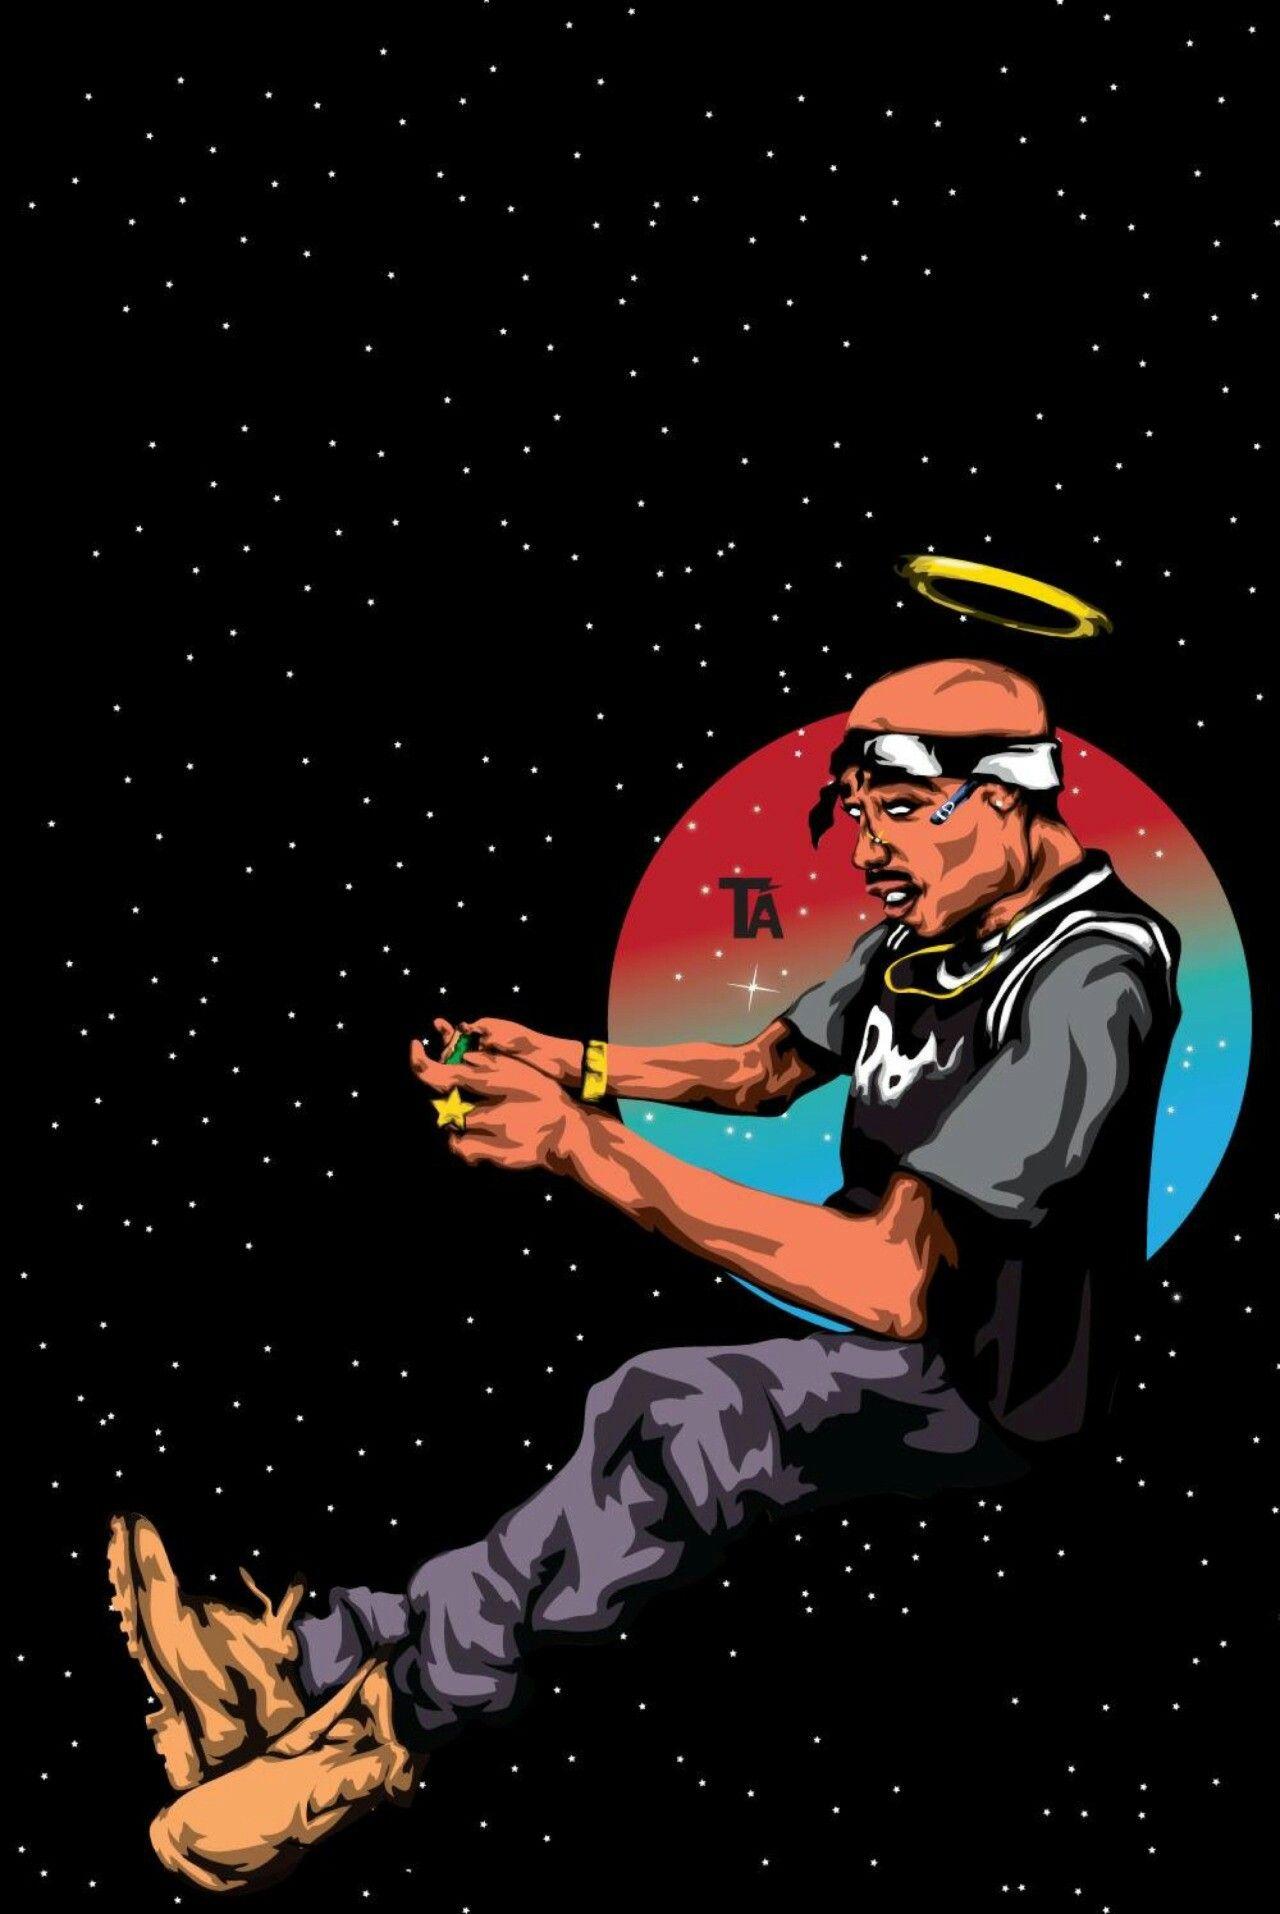 Pin by Theodora Major on Tupac Shakur Hip hop art, Tupac